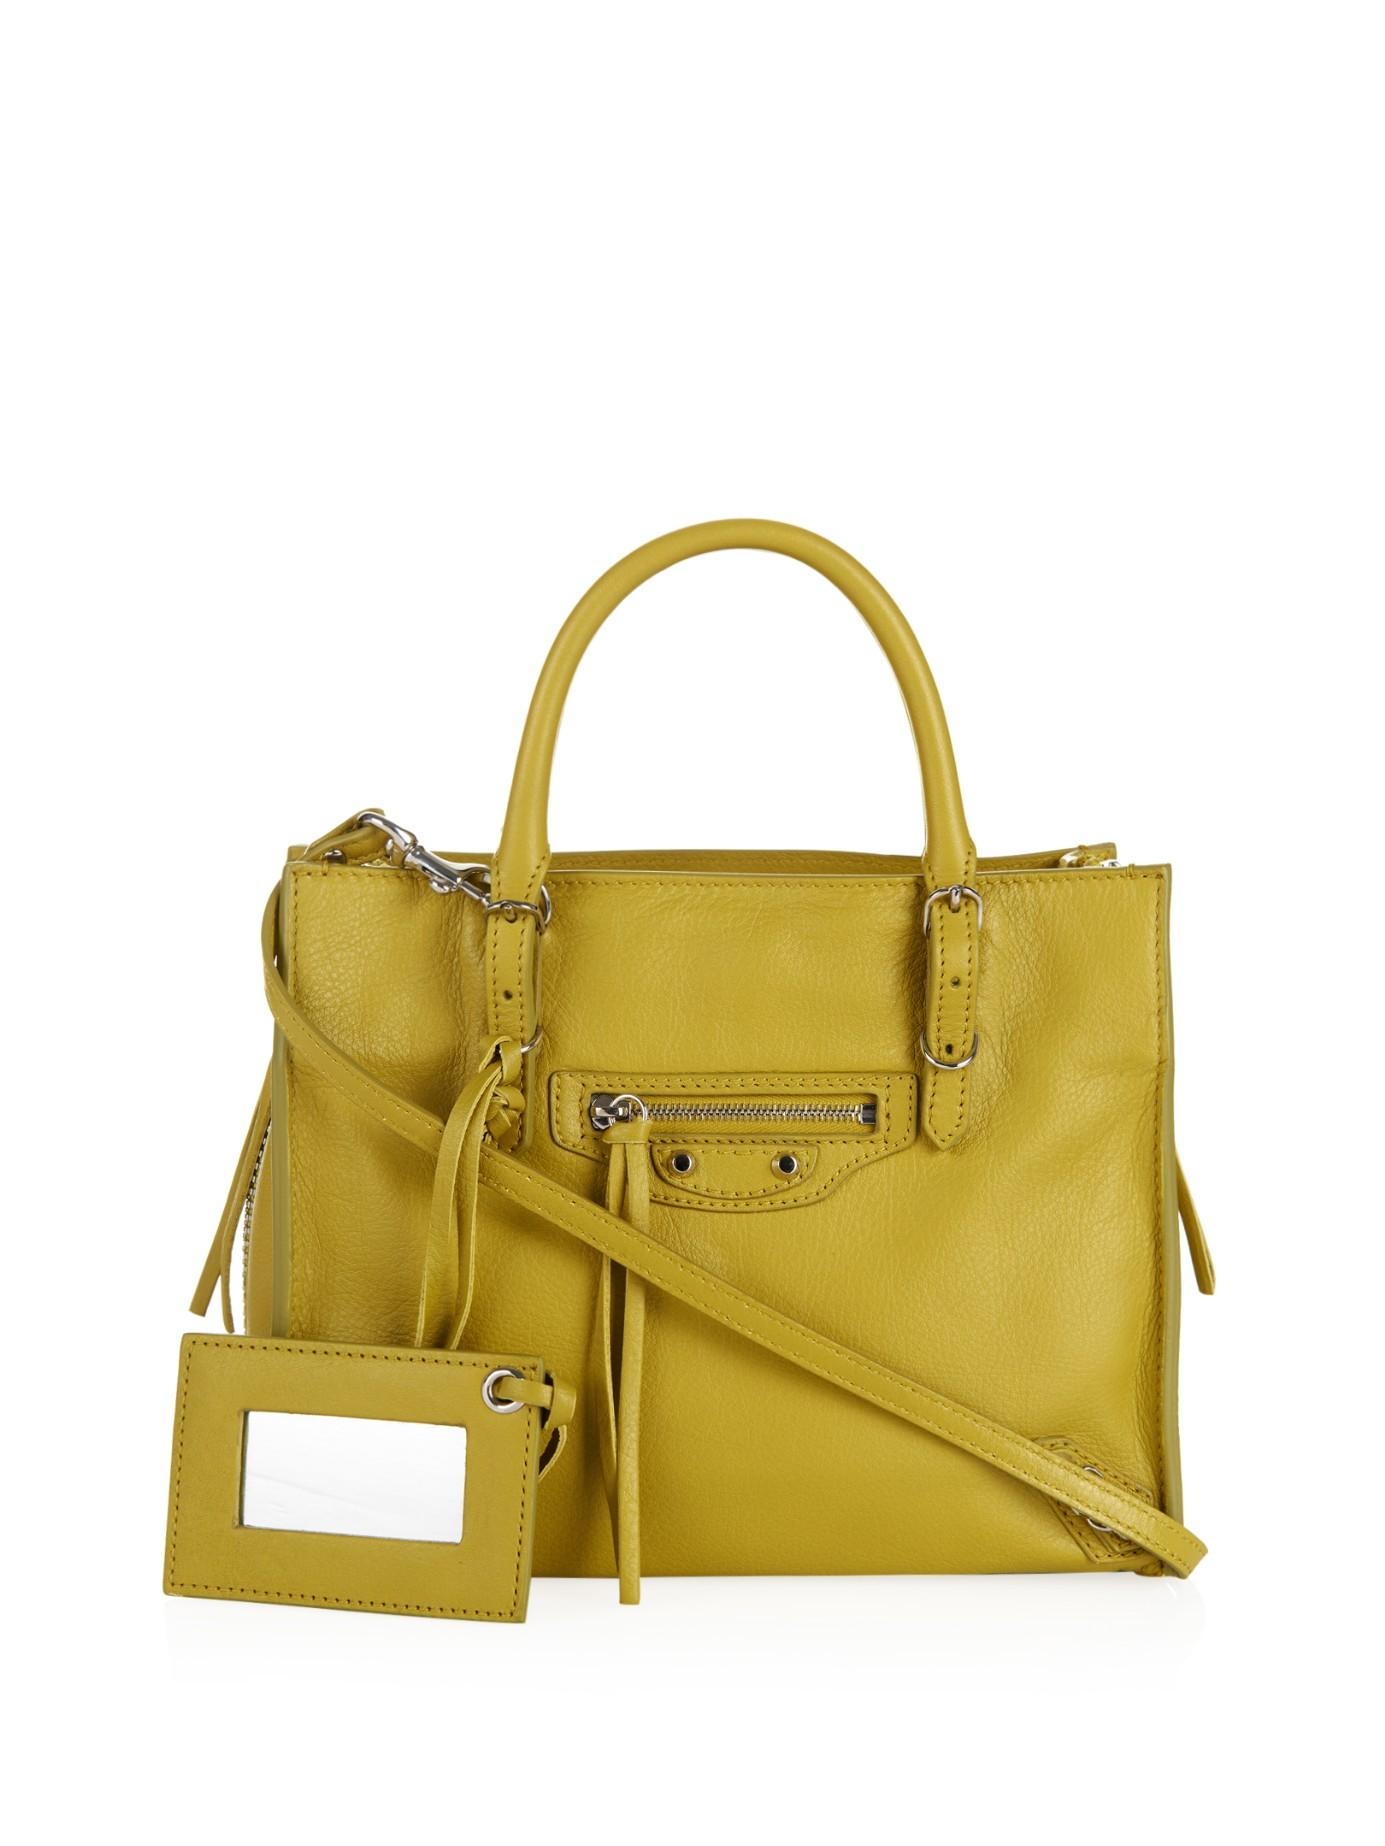 0fb1a8d5d5d Balenciaga Mini Papier A4 Leather Cross-body Bag in Yellow - Lyst